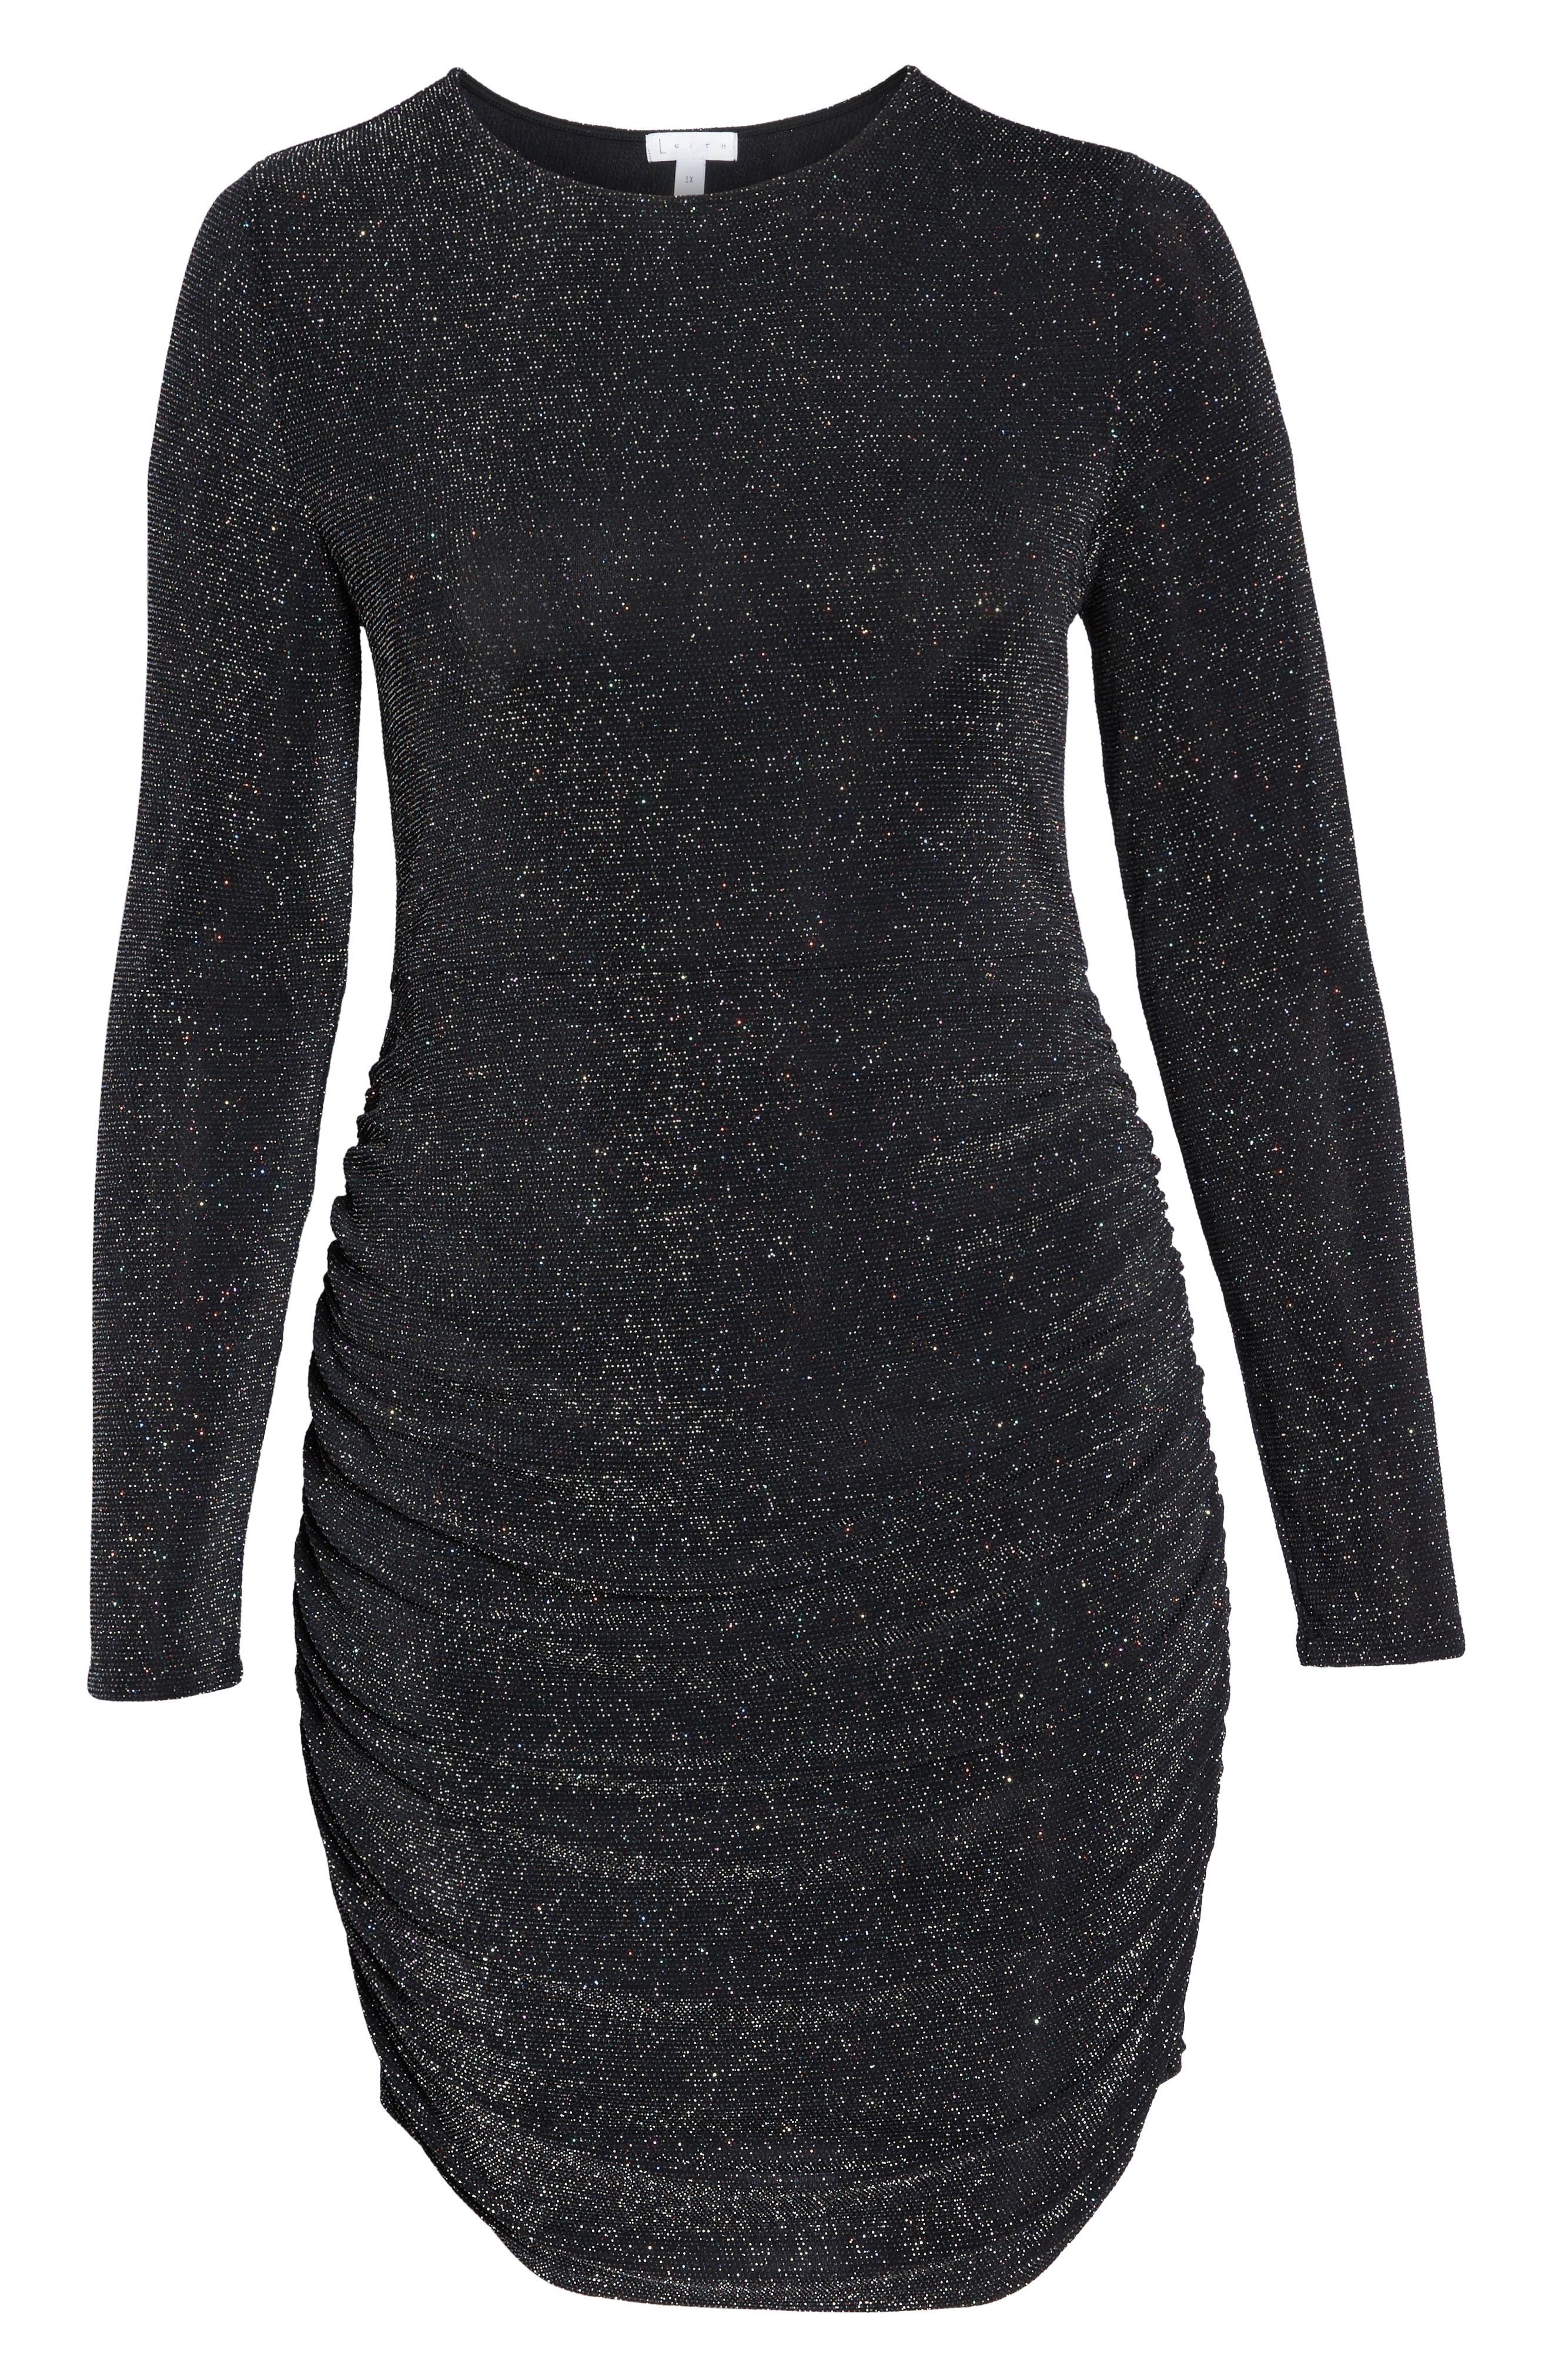 Metallic Body-Con Dress,                             Alternate thumbnail 7, color,                             BLACK MULTI GLITTER